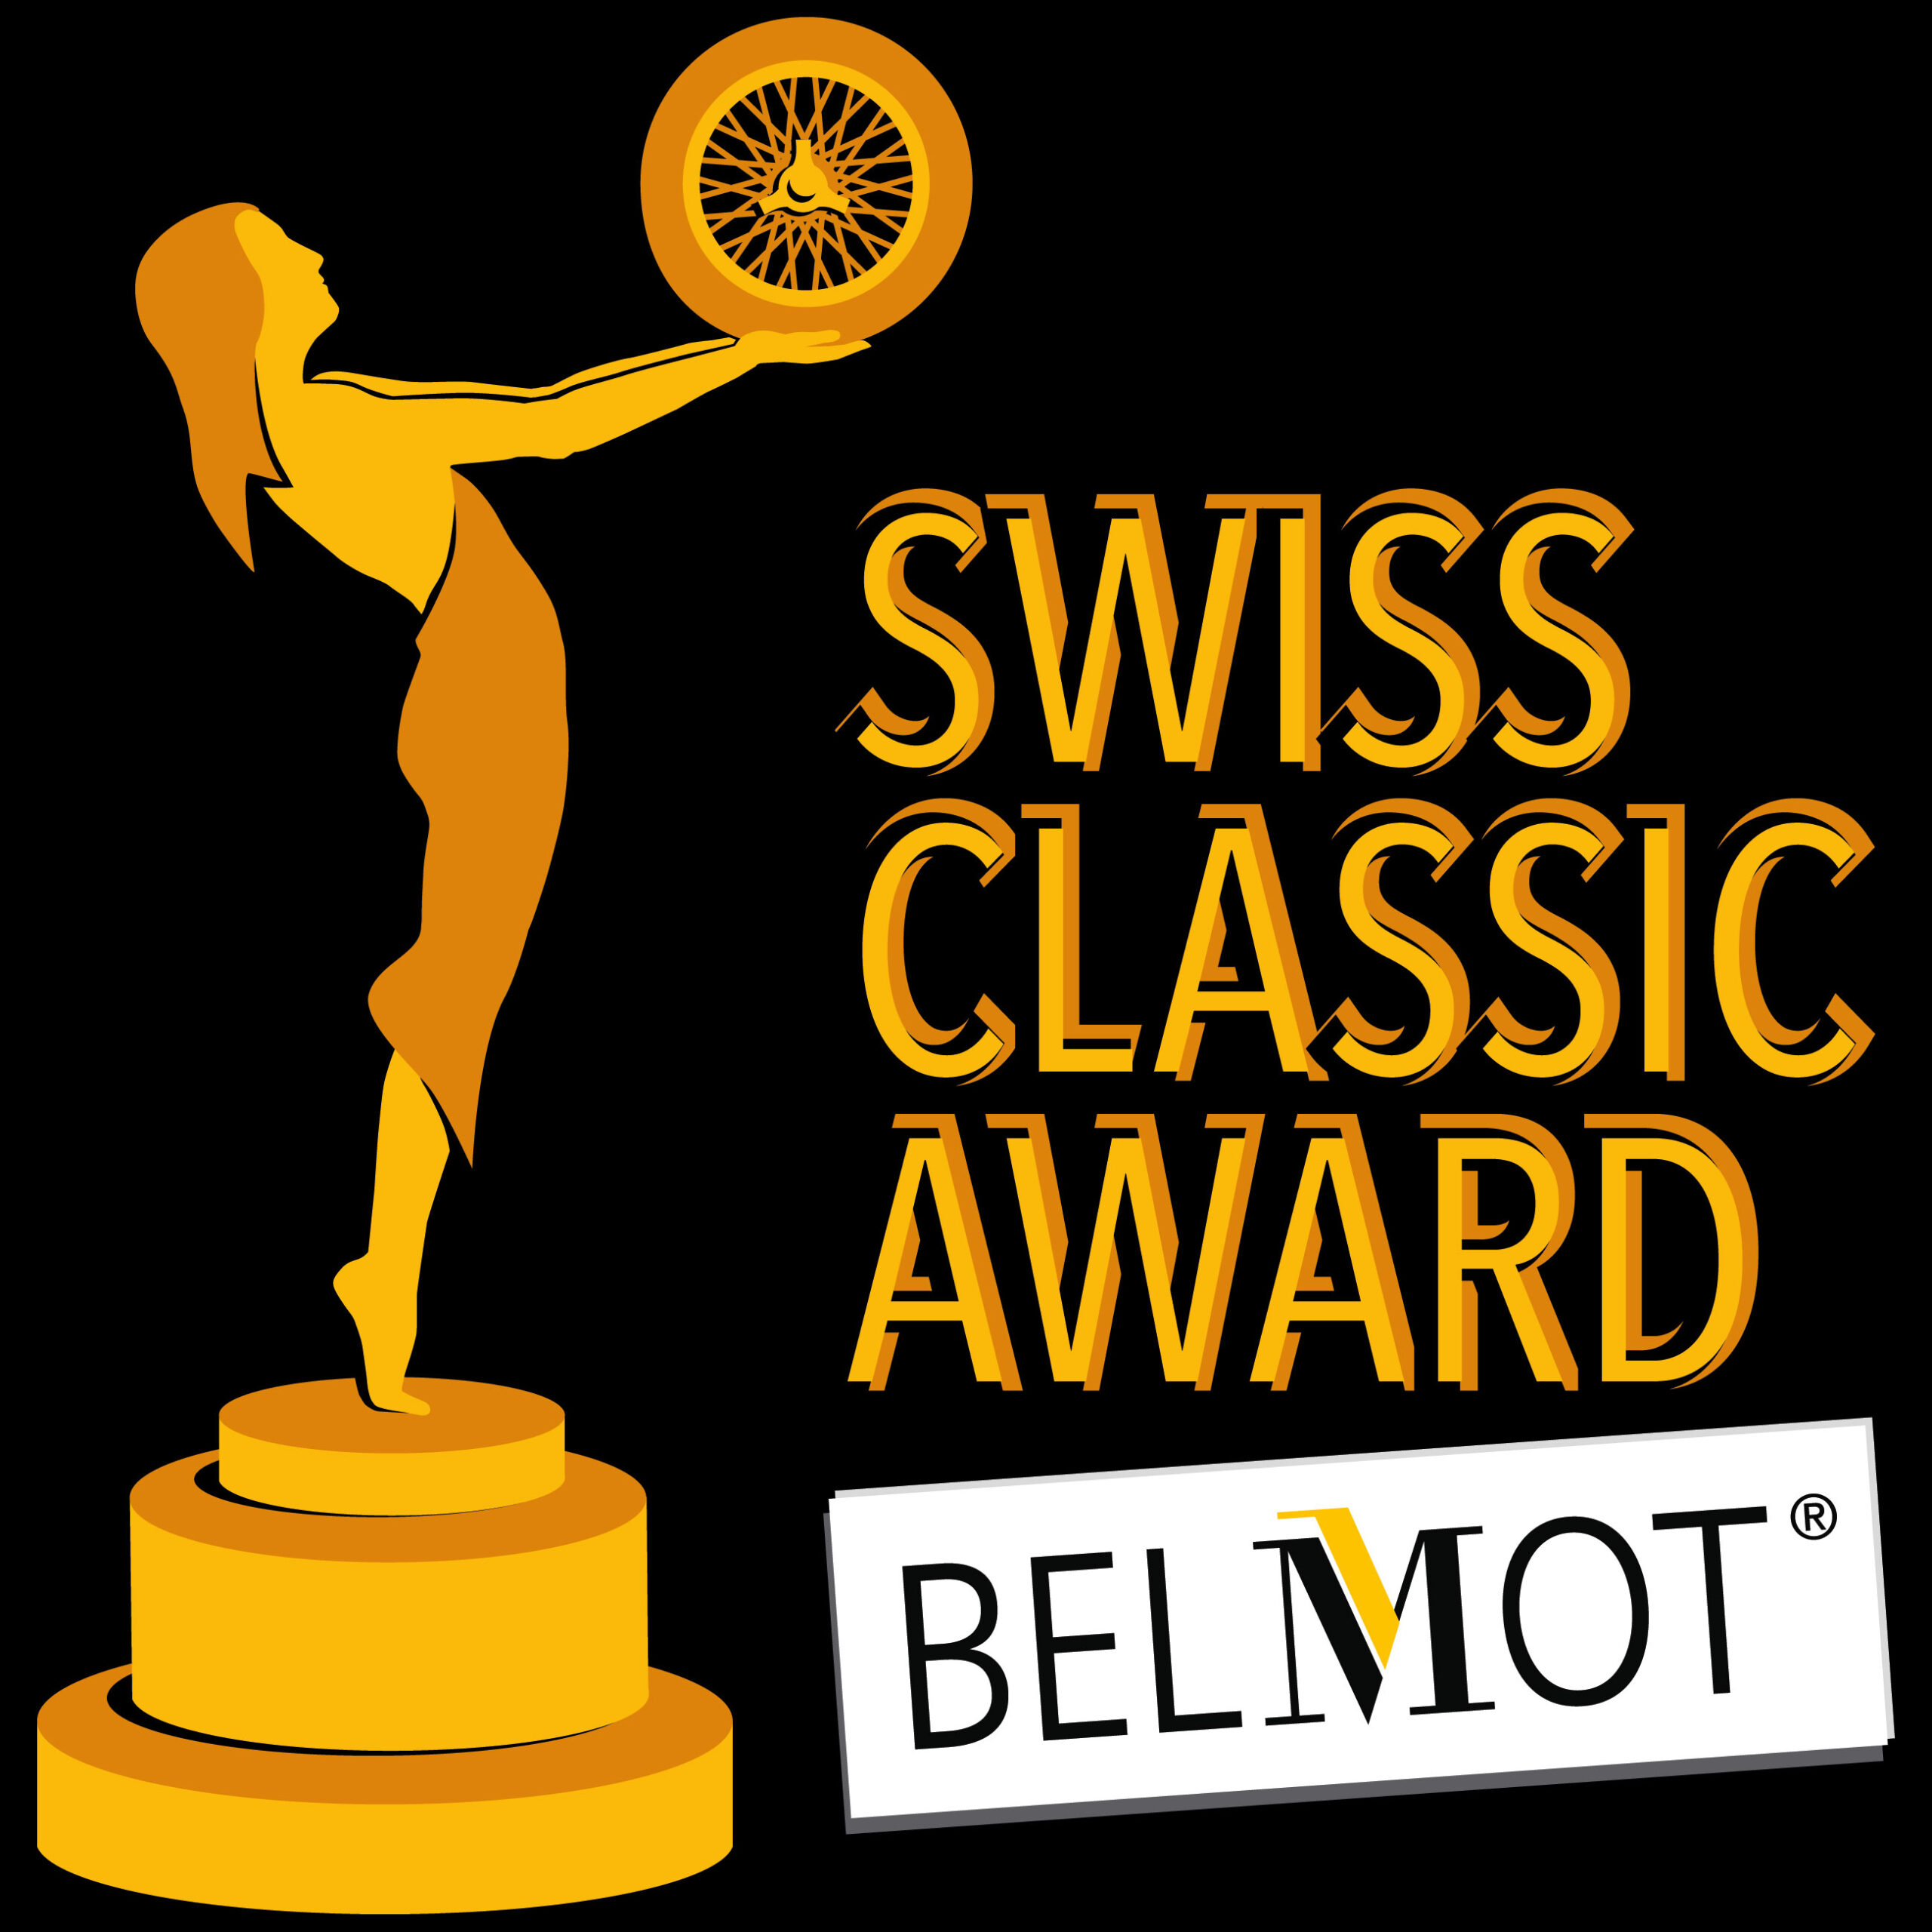 SWISS CLASSIC AWARD 2020